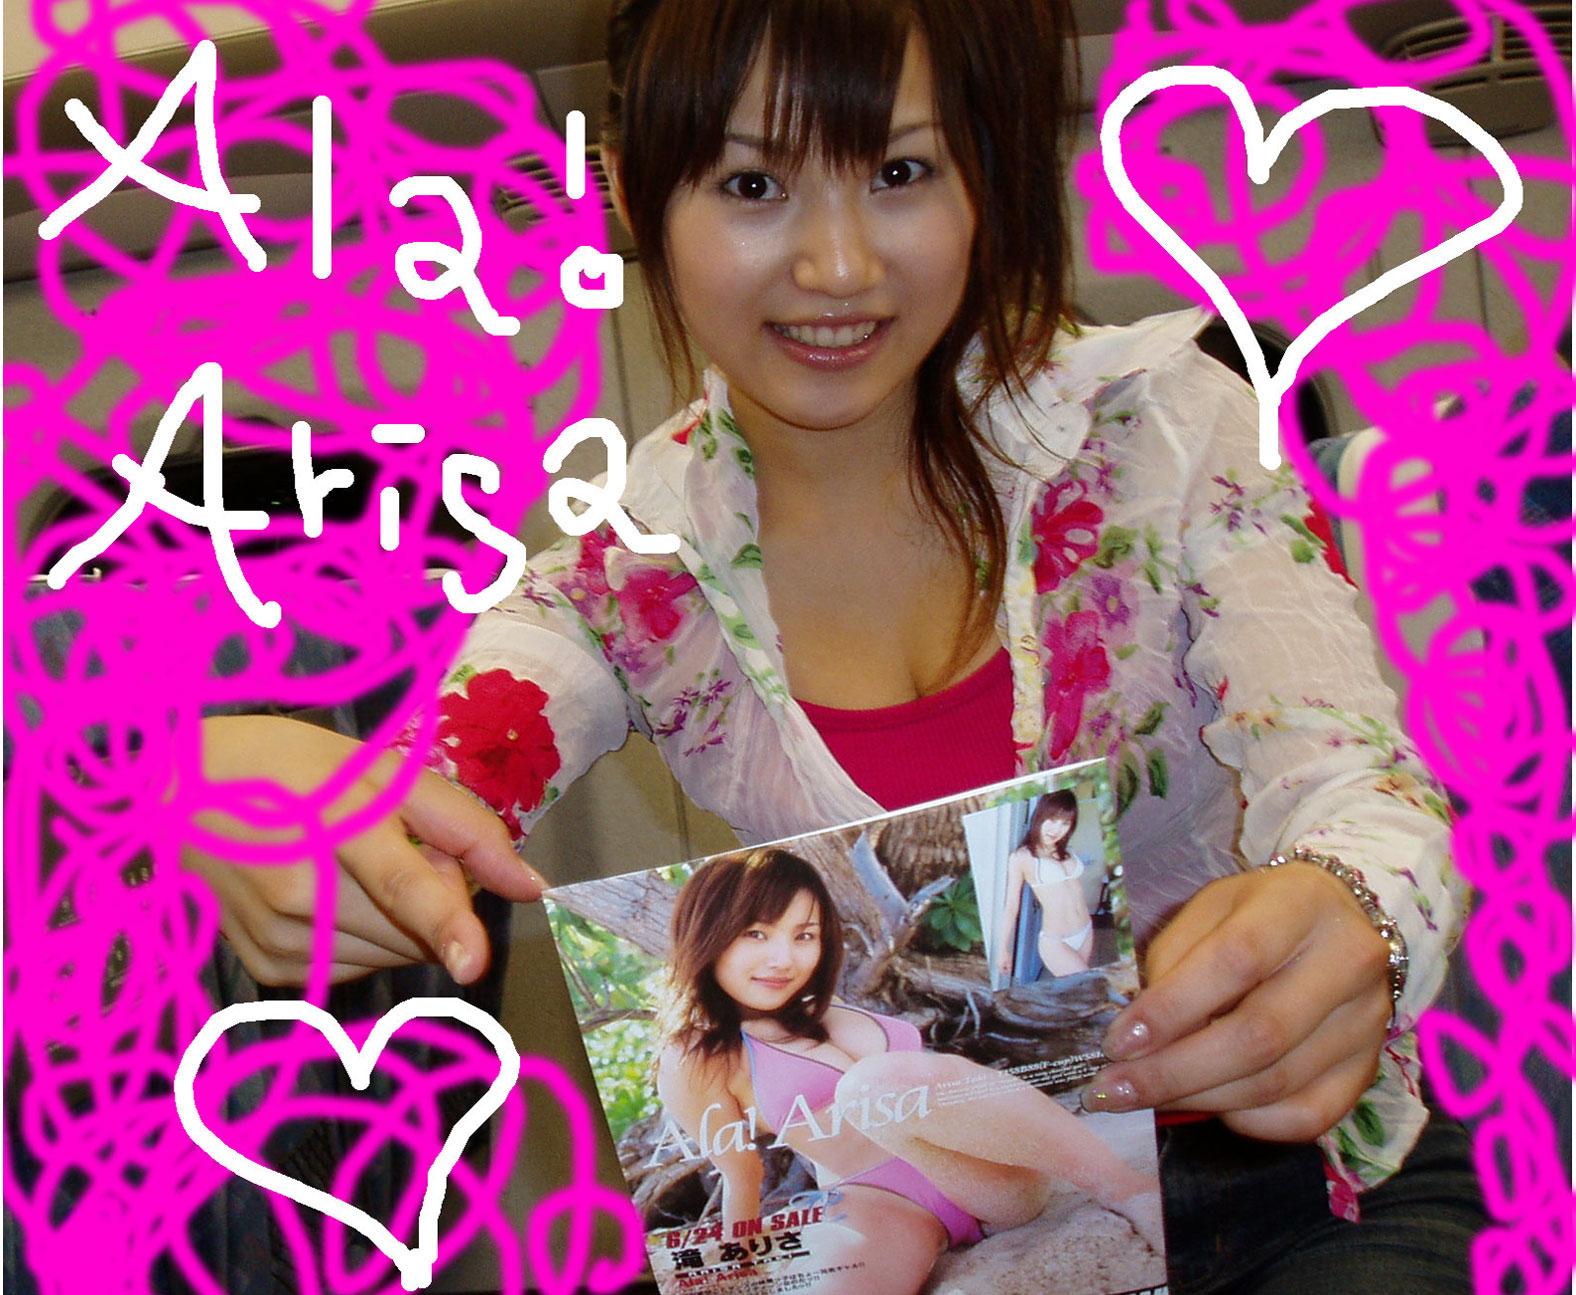 ♪Ala!Arisa♪(*^▽^*)v_c0038100_4345367.jpg